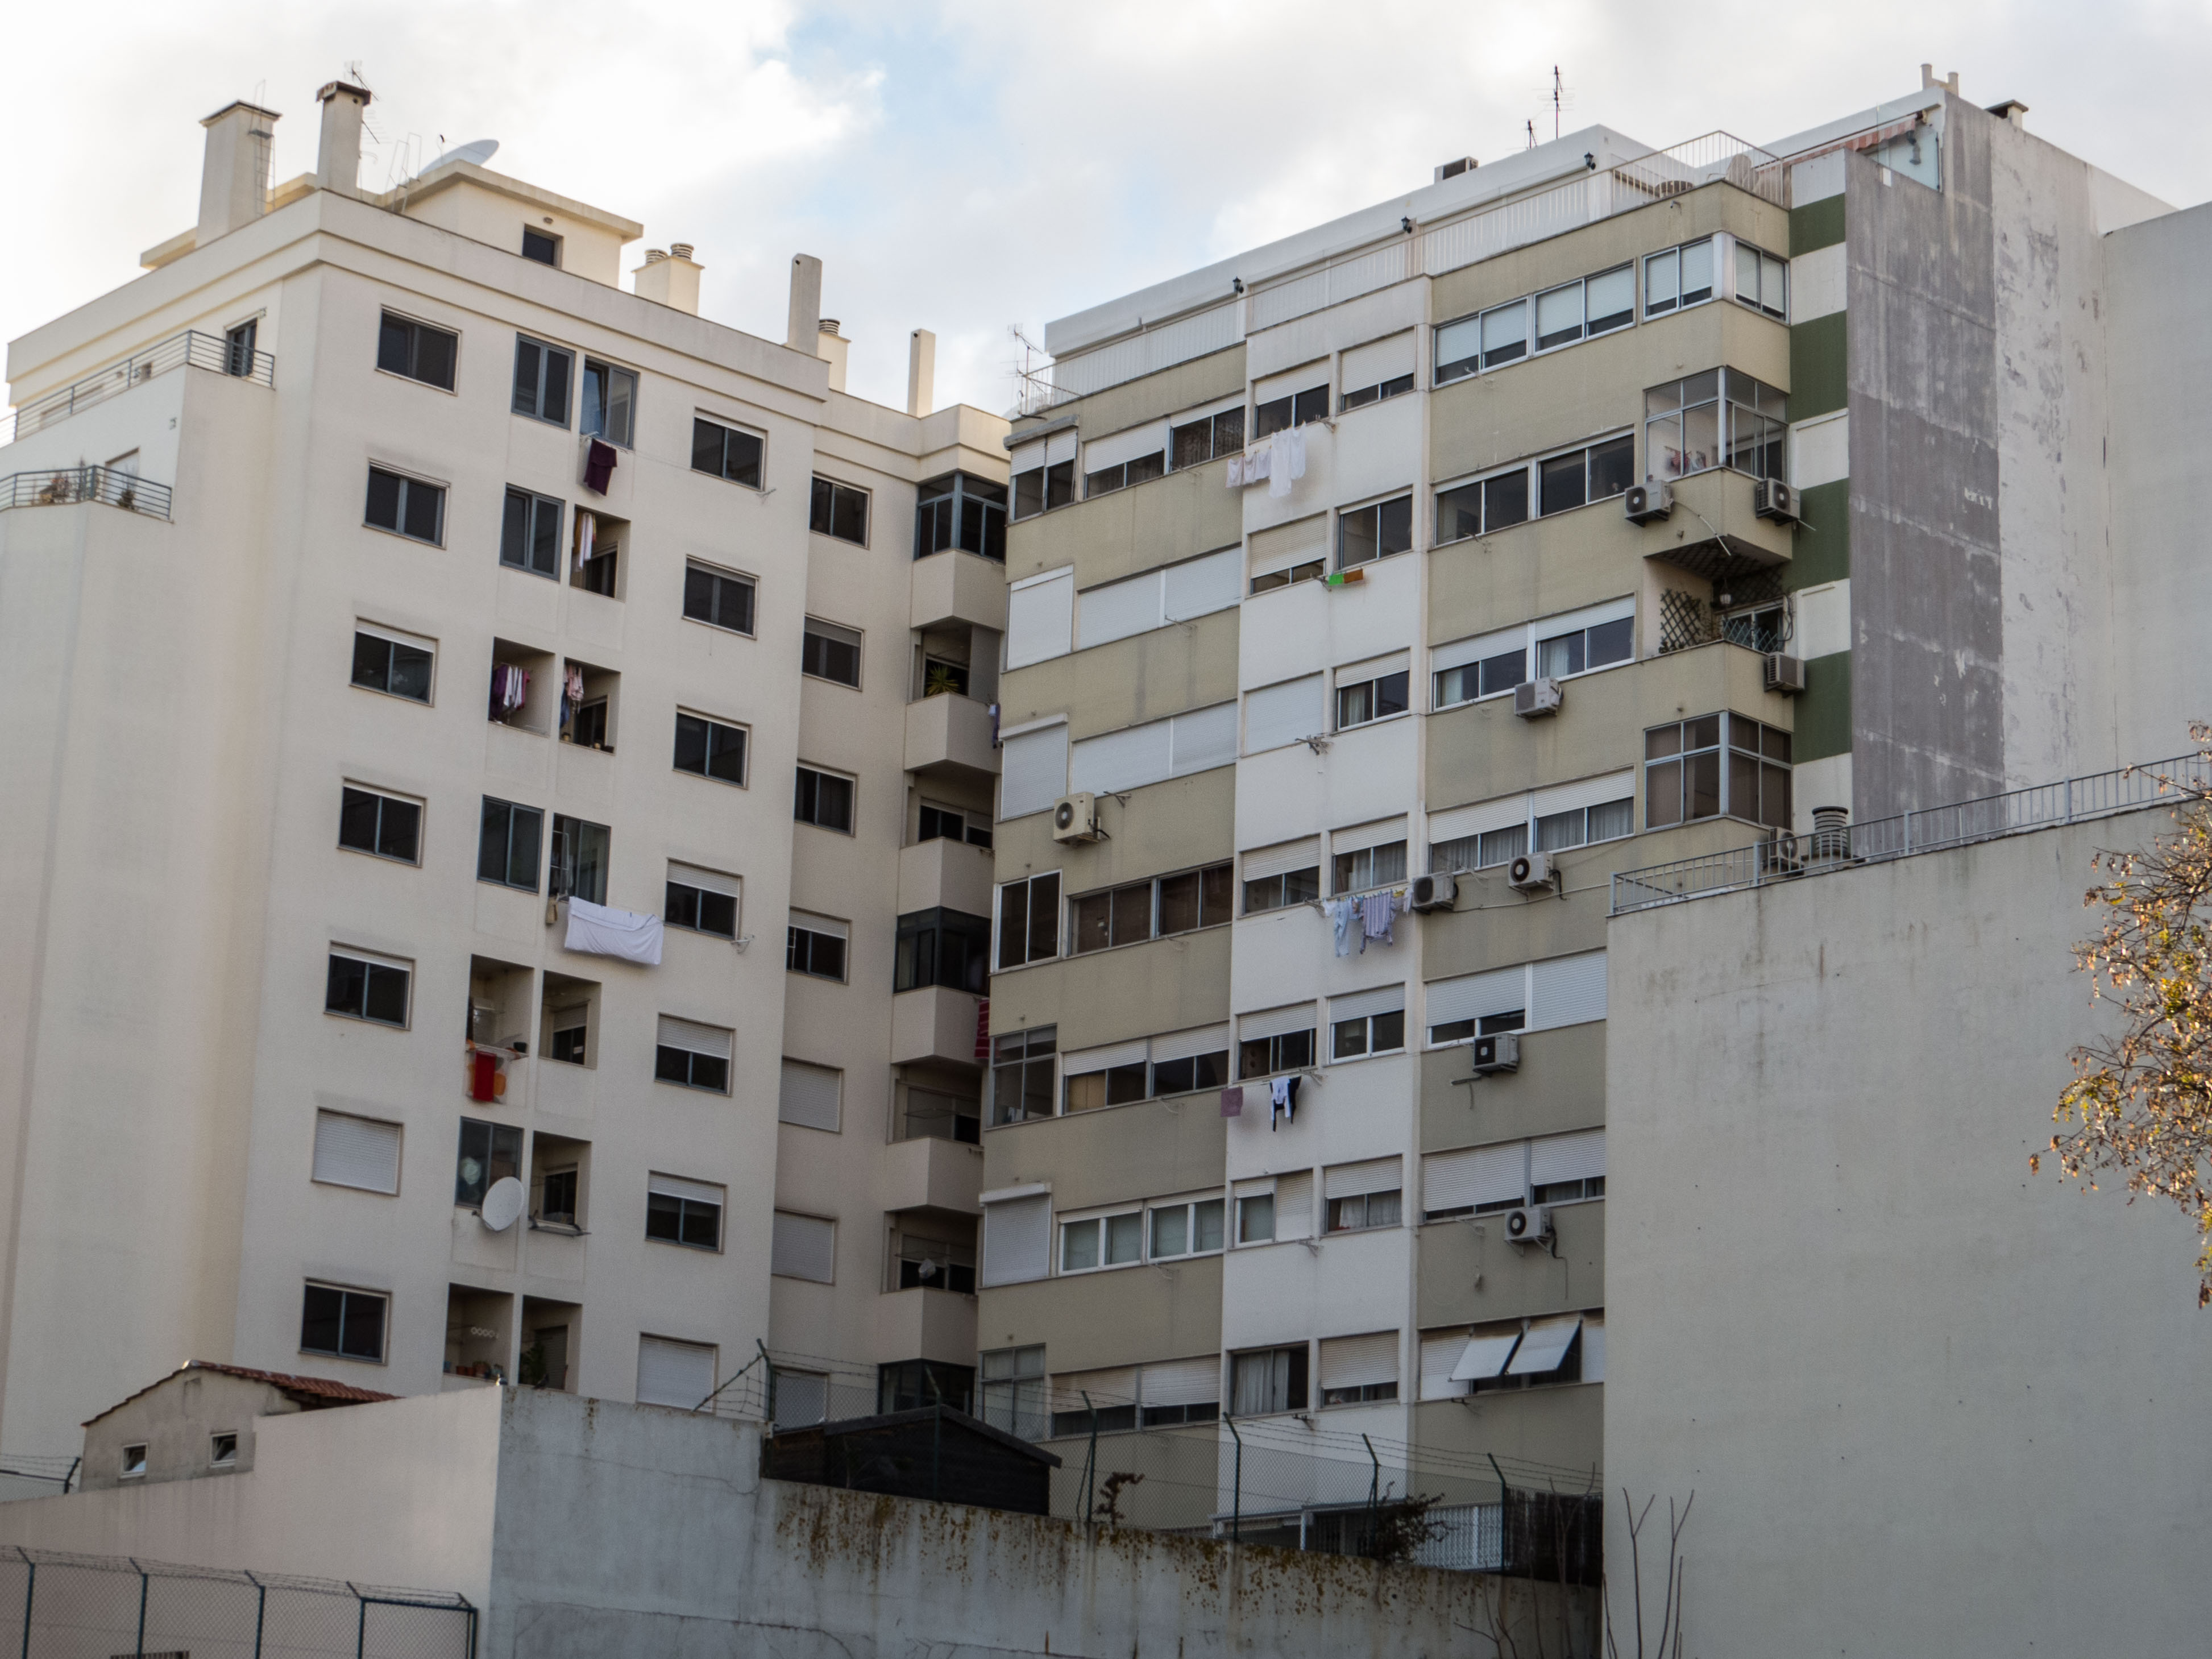 Lisbon architecture - slum, Bad, Building, Floors, High, HQ Photo